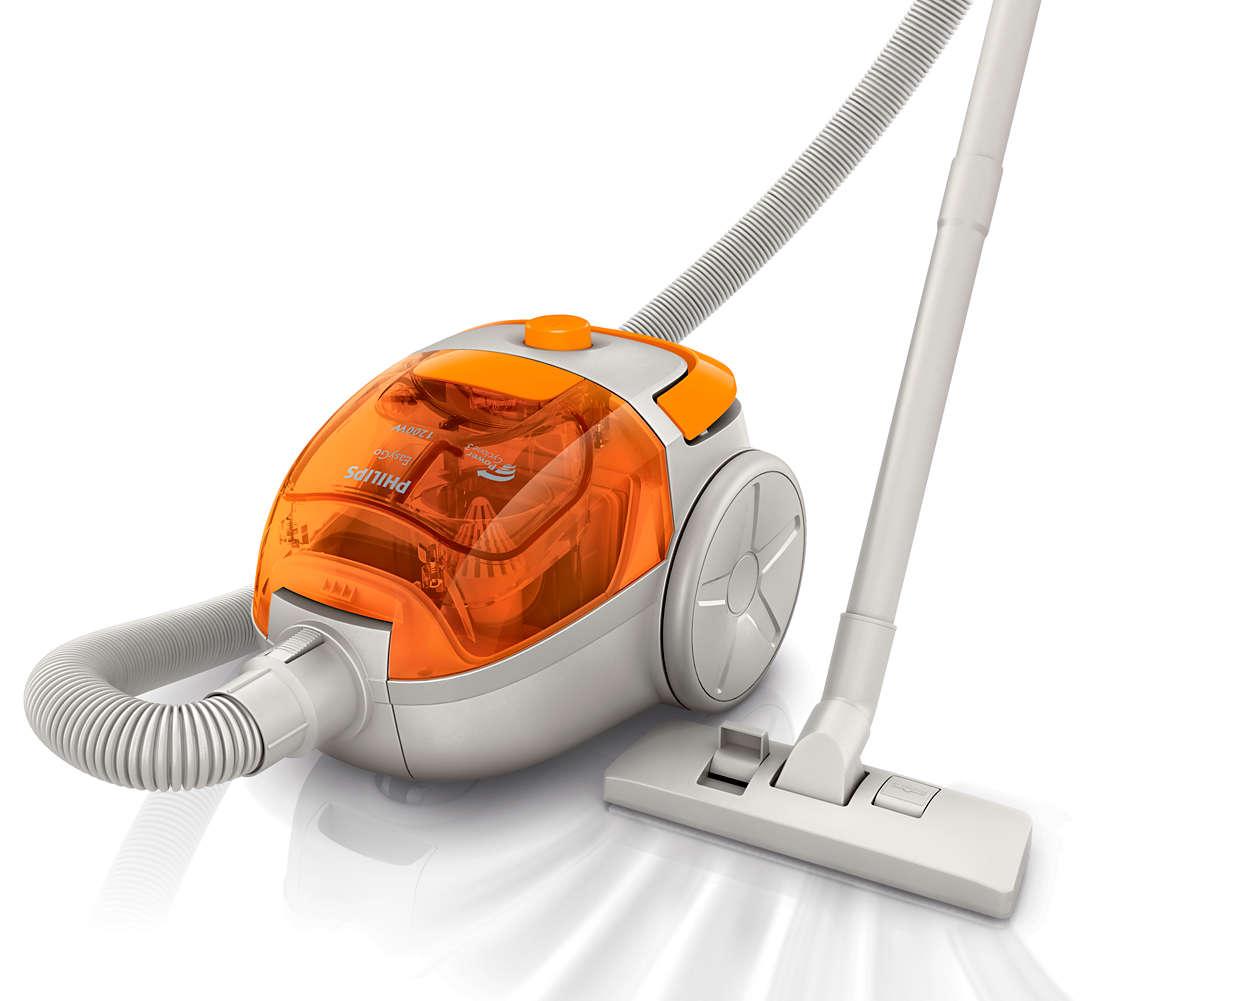 1400w bagless vacuum cleaner